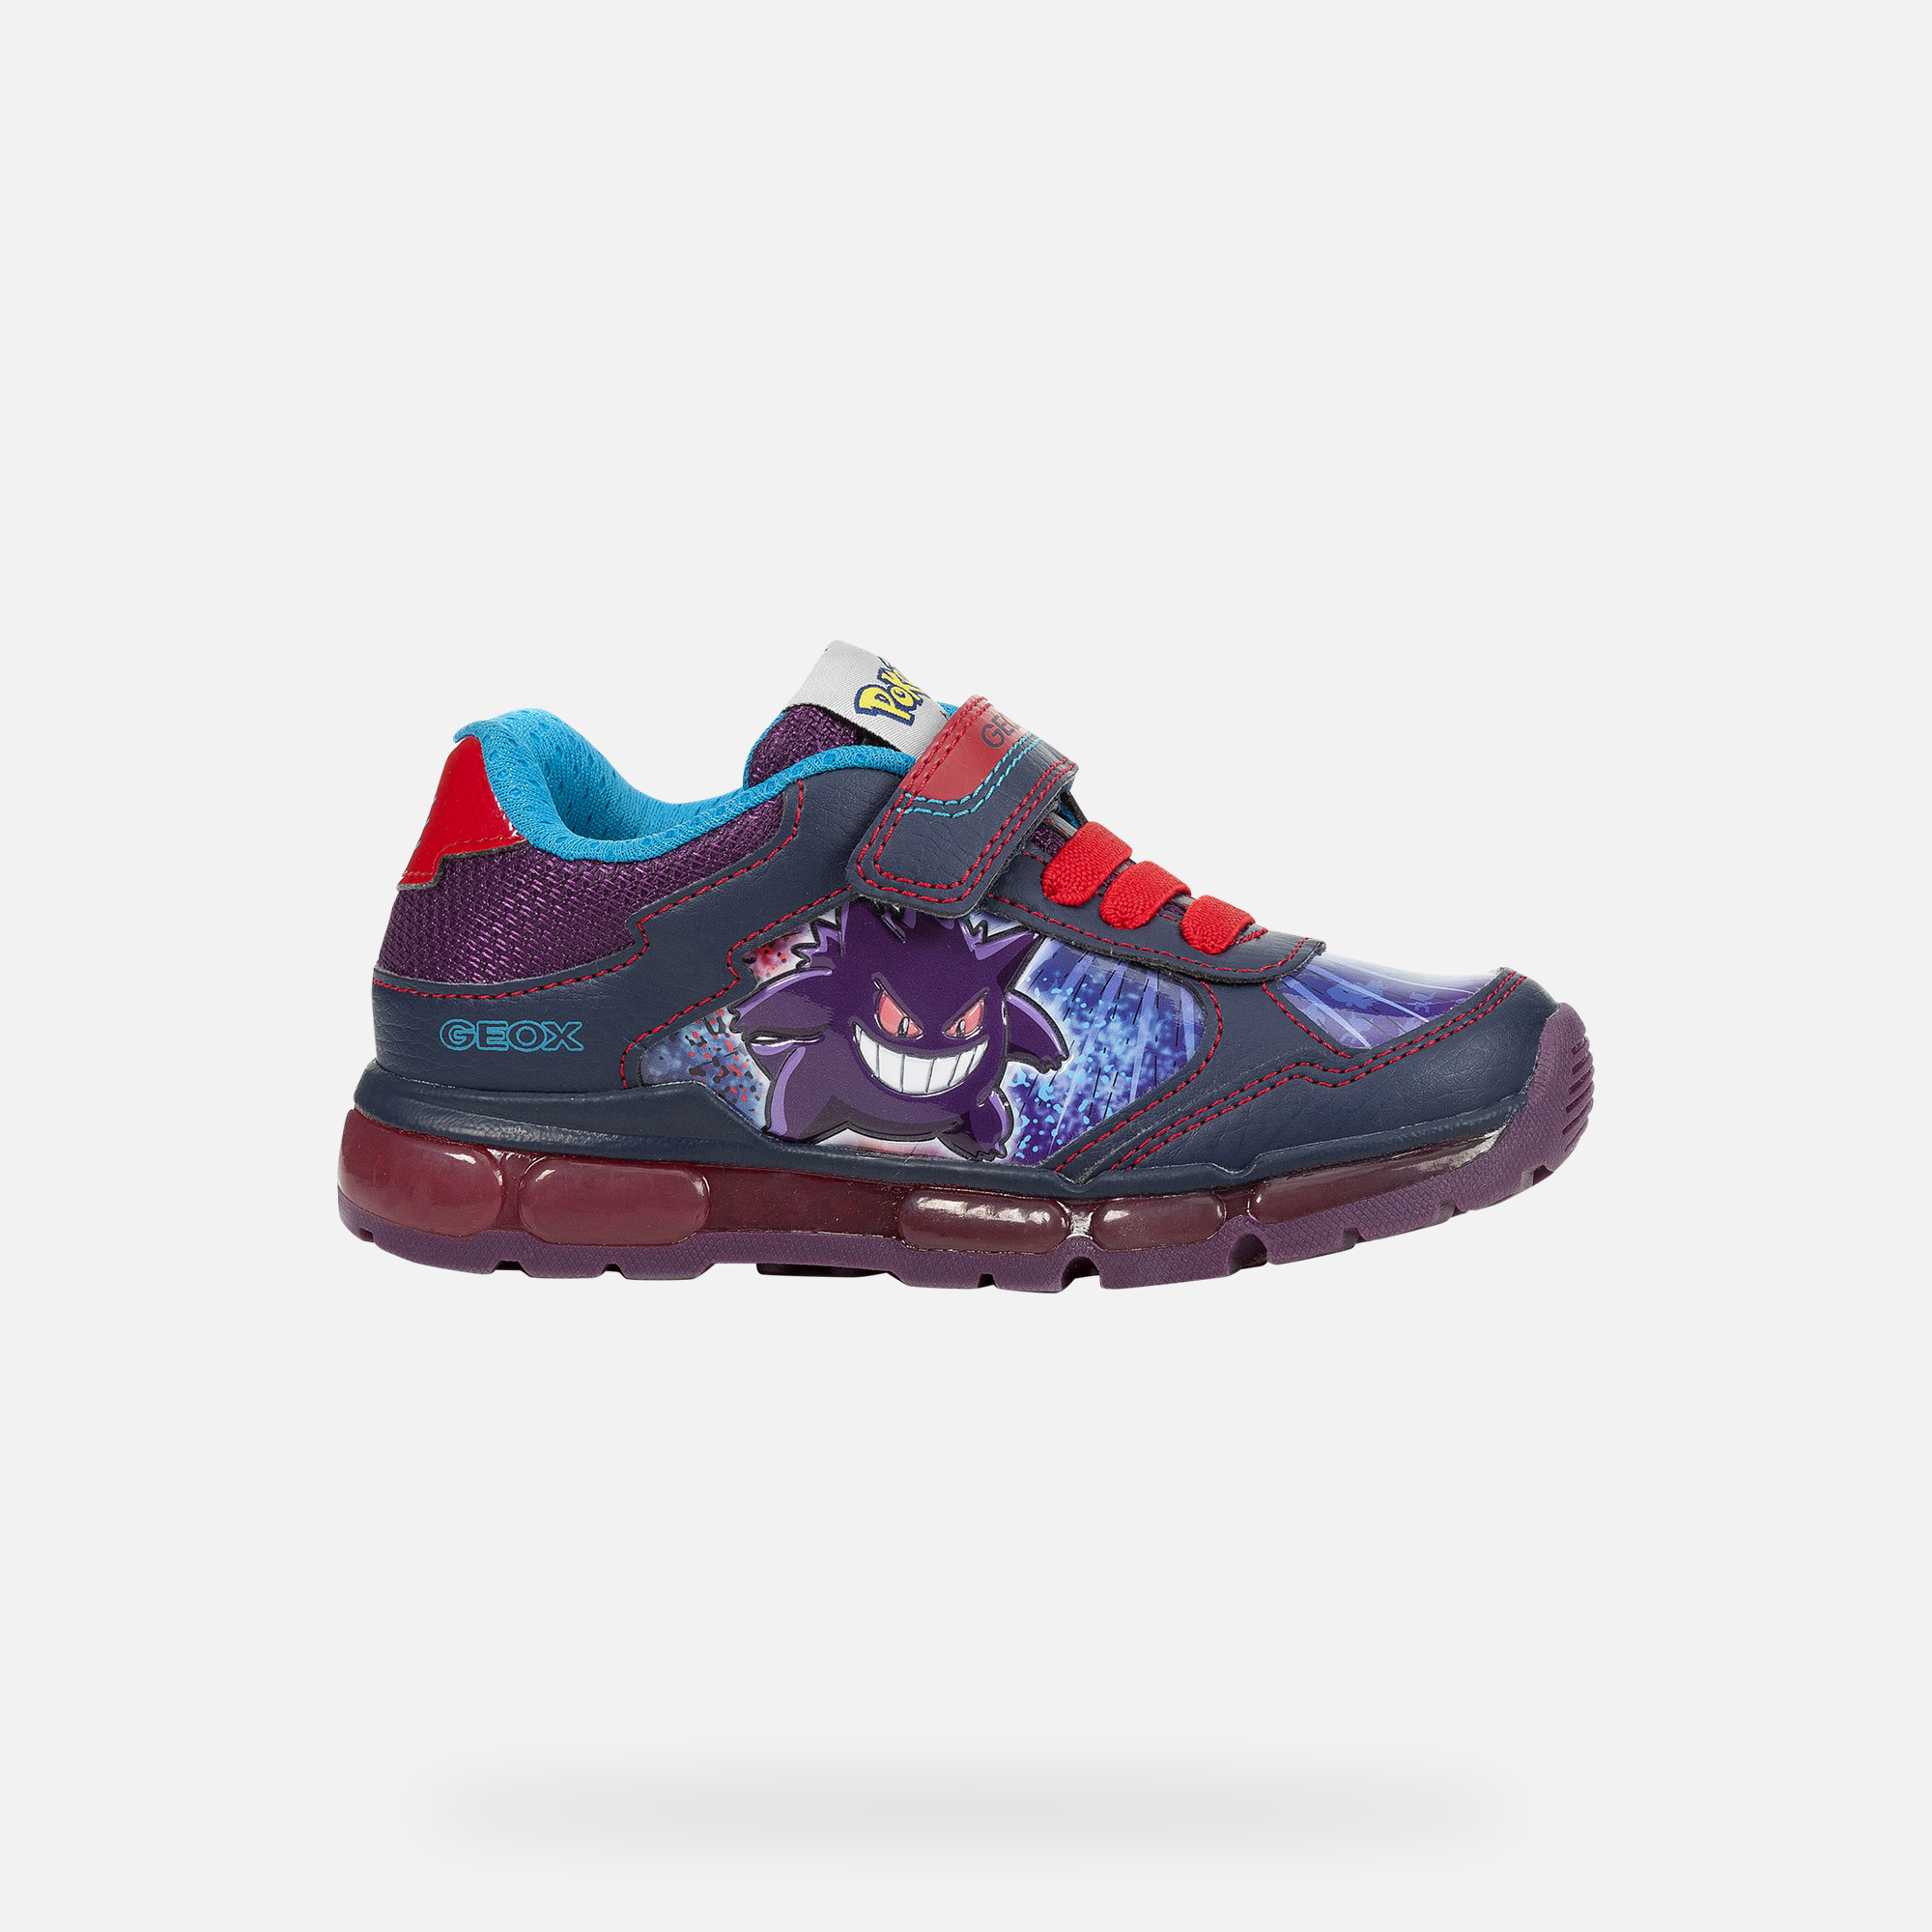 Garçon Geox Chaussures De Boy Android Jr Led Qw1trwapx EnYYOSqxw